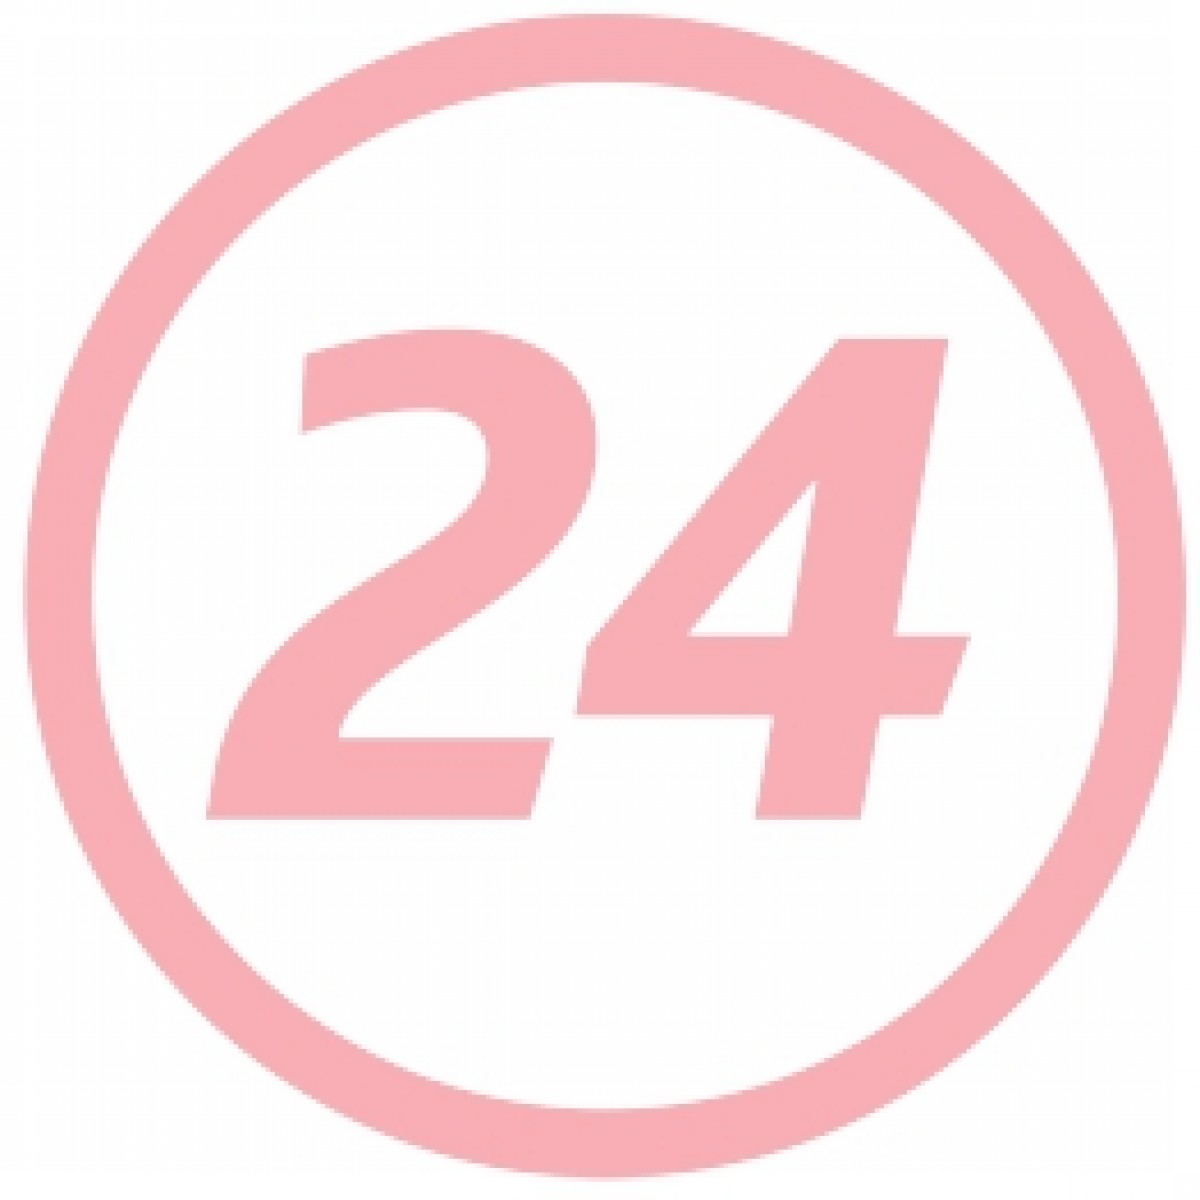 Tommee Tippee Kit Diversificare Hrana 4+ Luni Pentru Baieti, Kit, 1buc